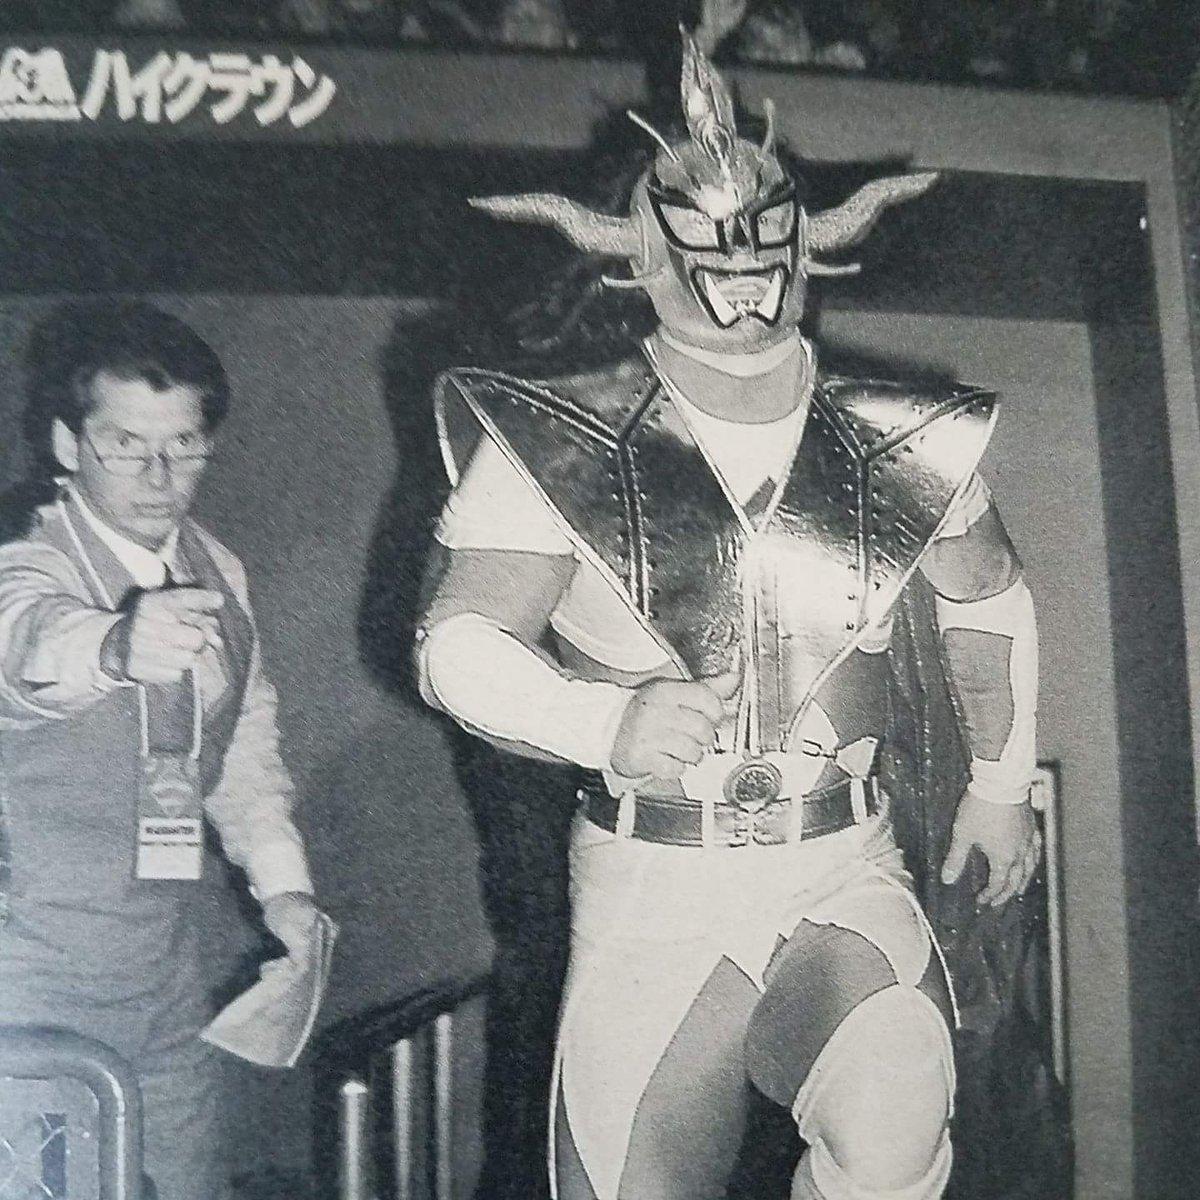 @90sWWE's photo on McMahon